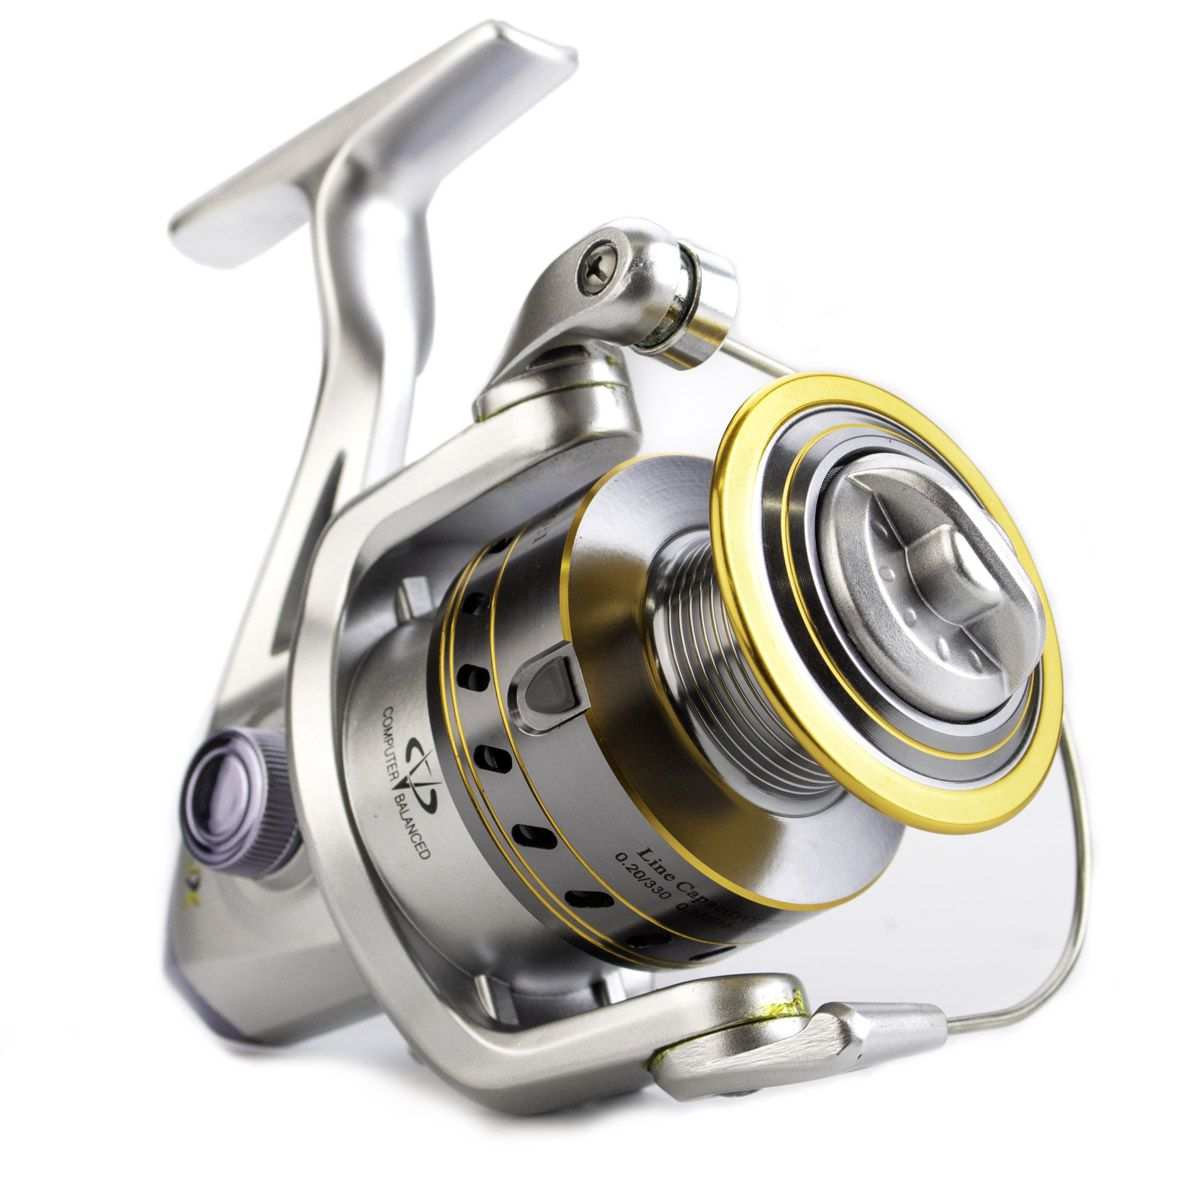 Molinete Rapala Corux 4000  - Comprando & Pescando